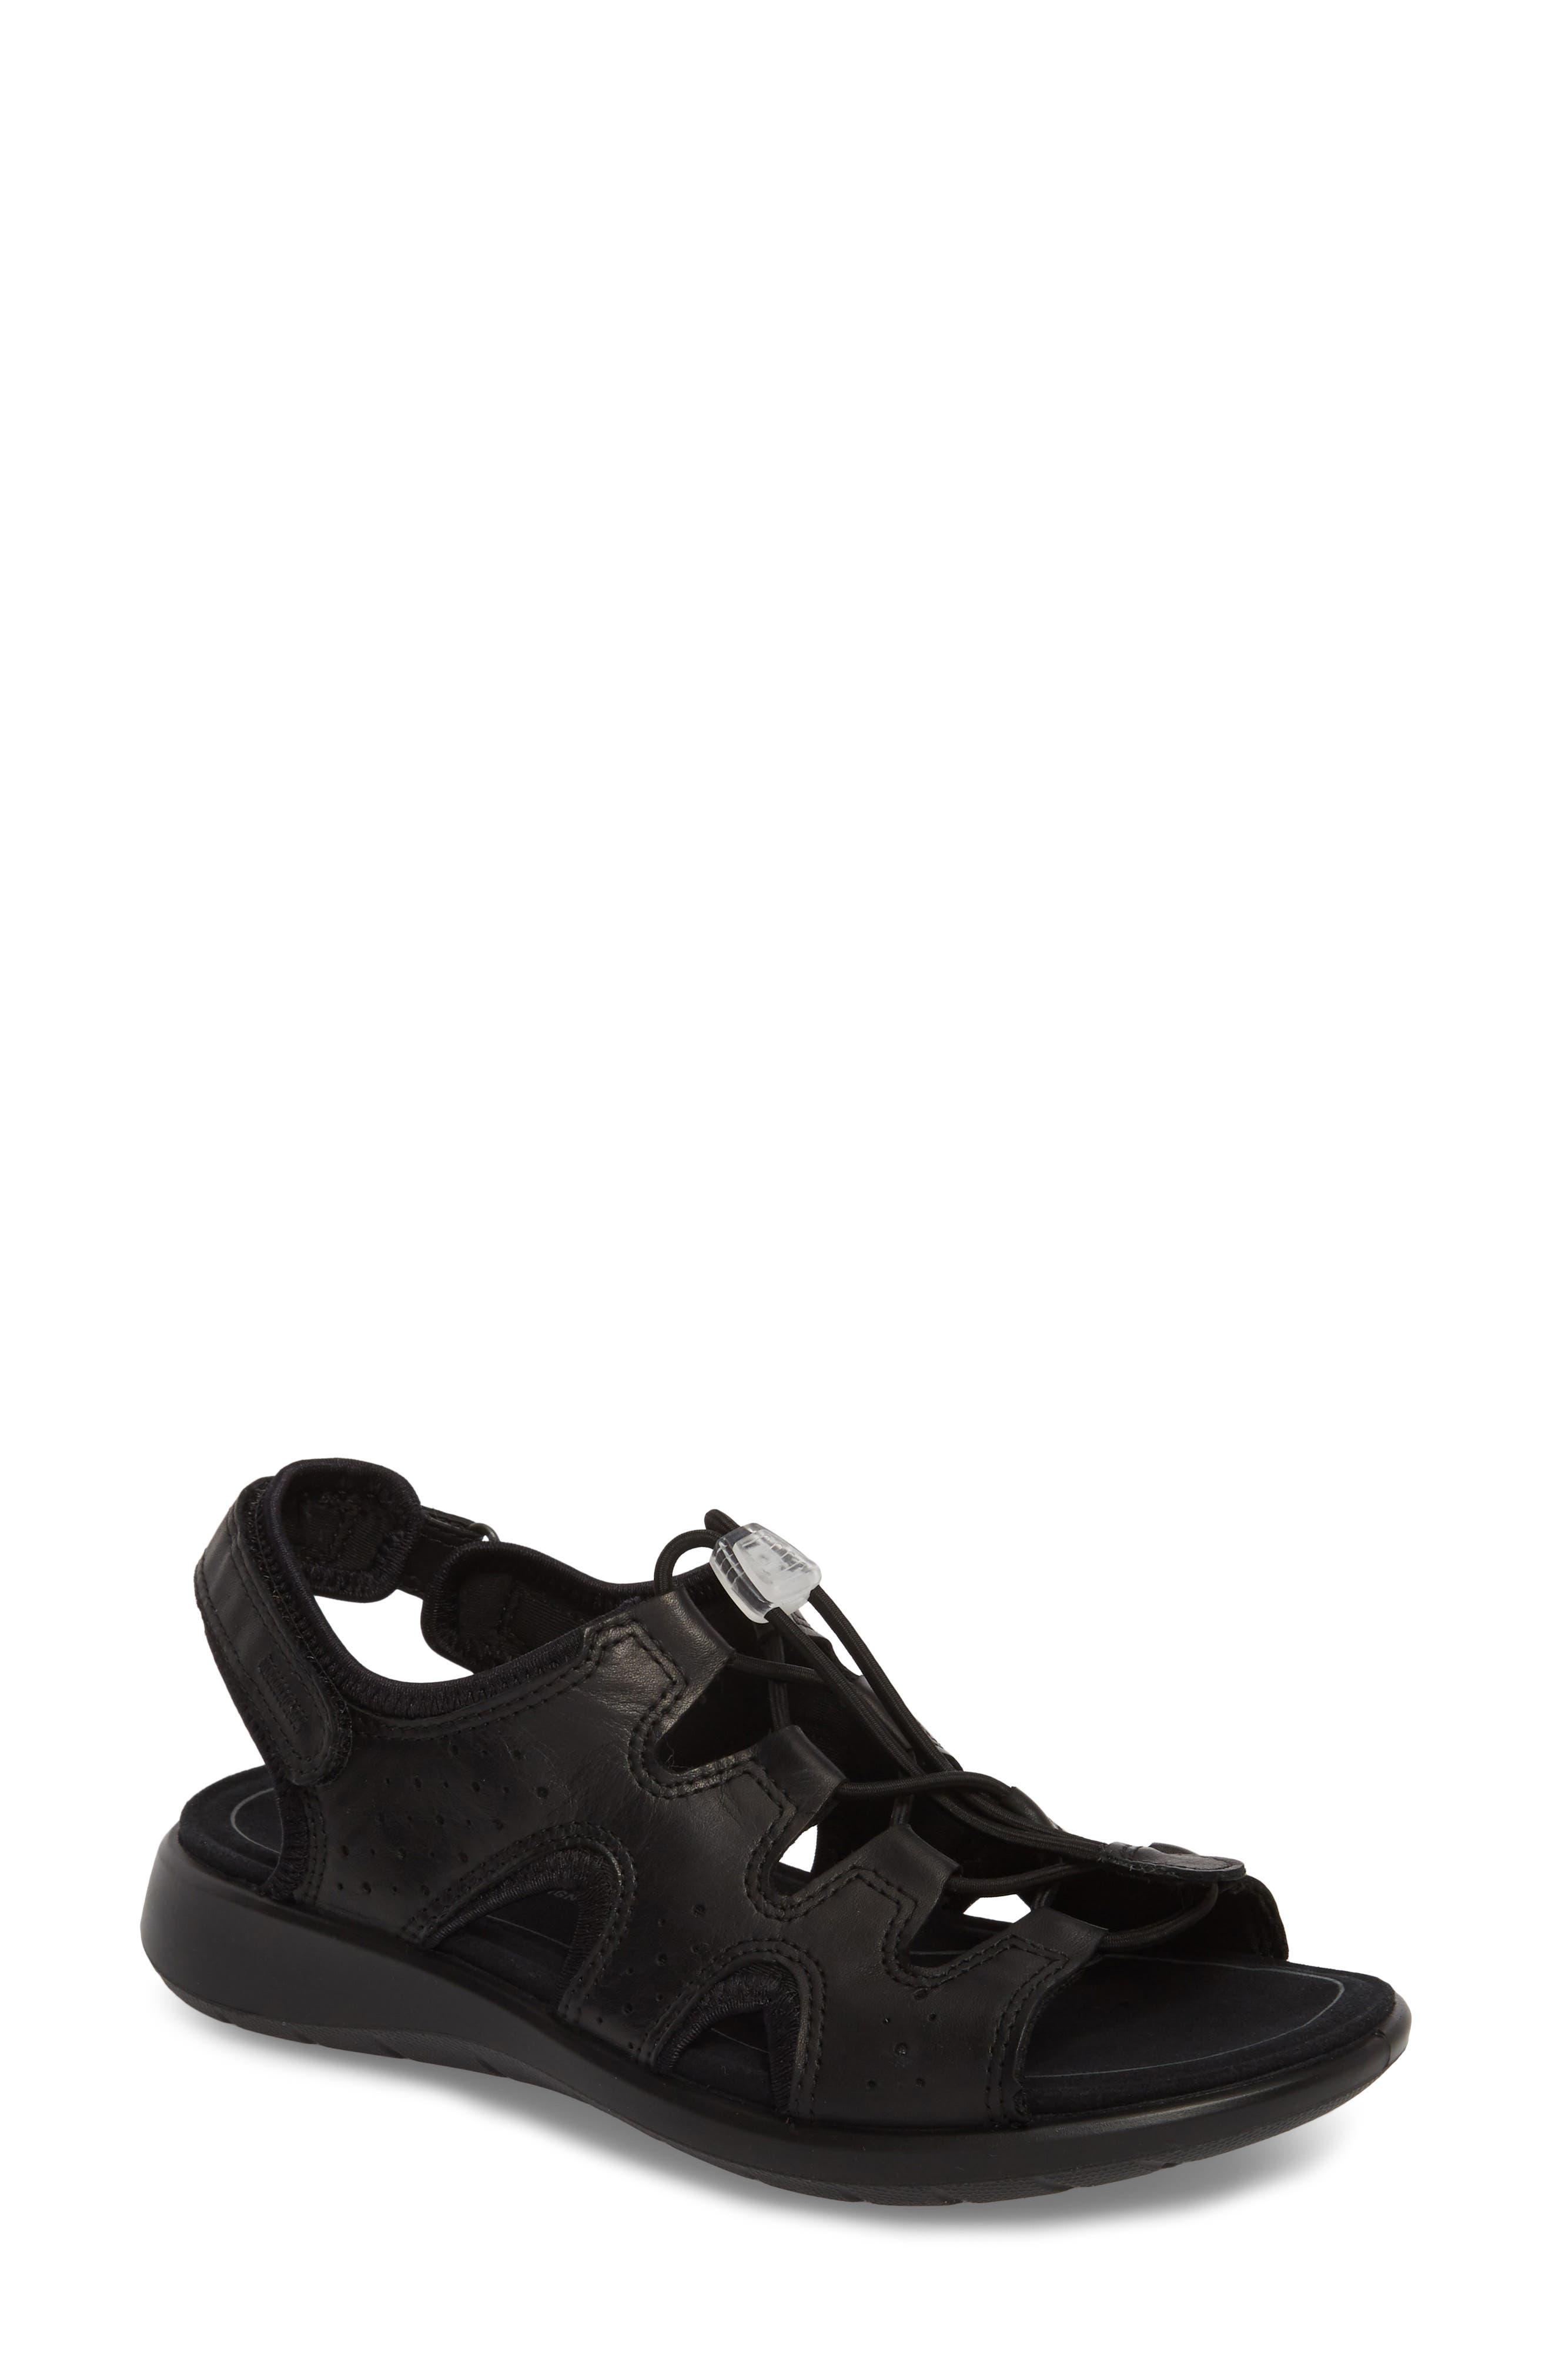 Bluma Toggle Sandal,                             Main thumbnail 1, color,                             Black Leather